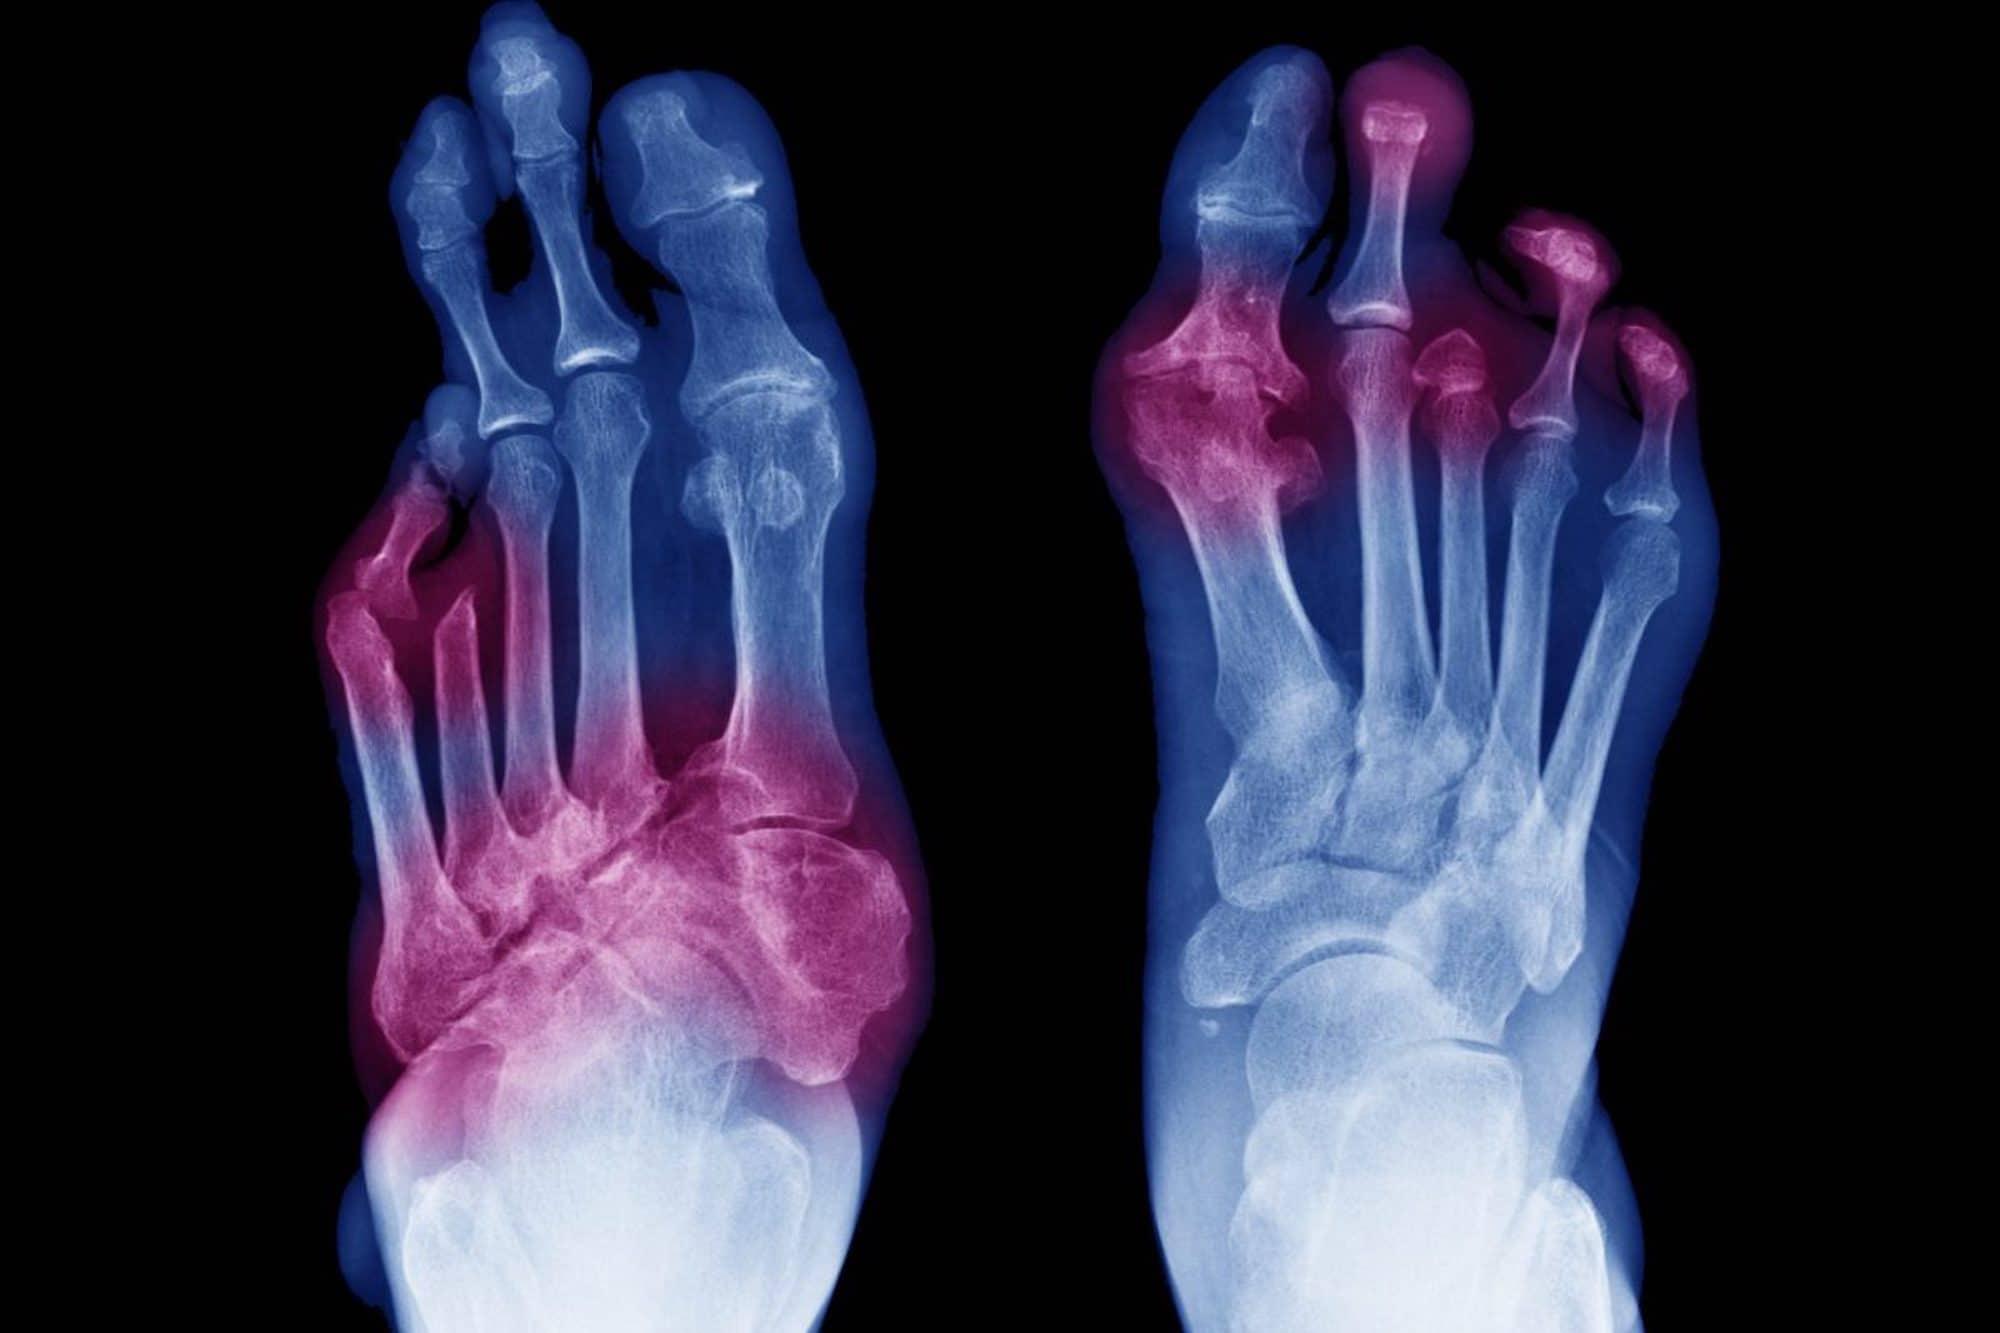 Chirurgie du pied - Dijon